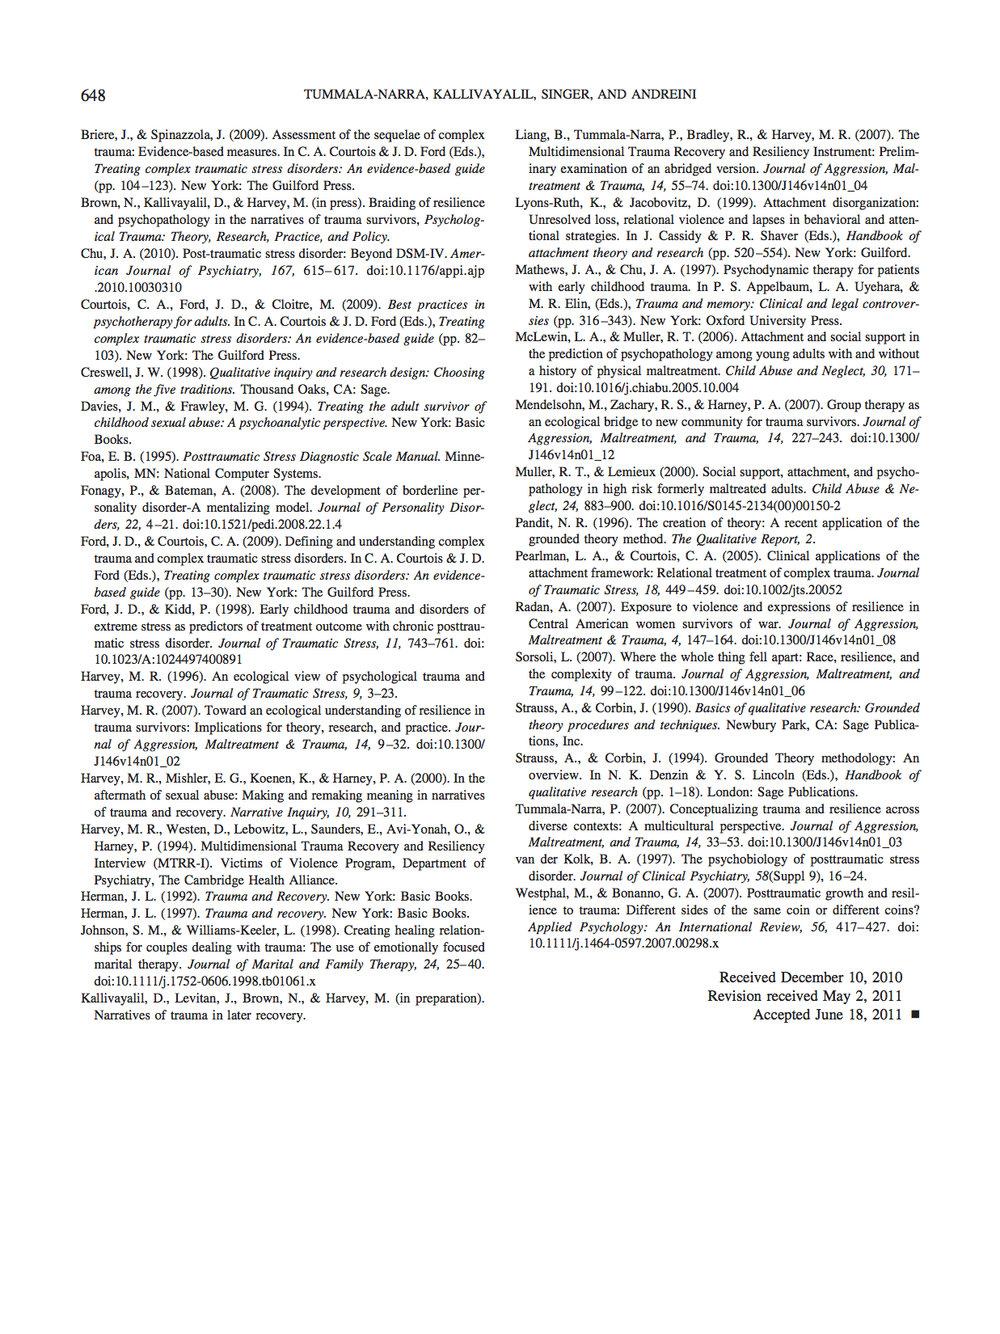 paper p9.jpg